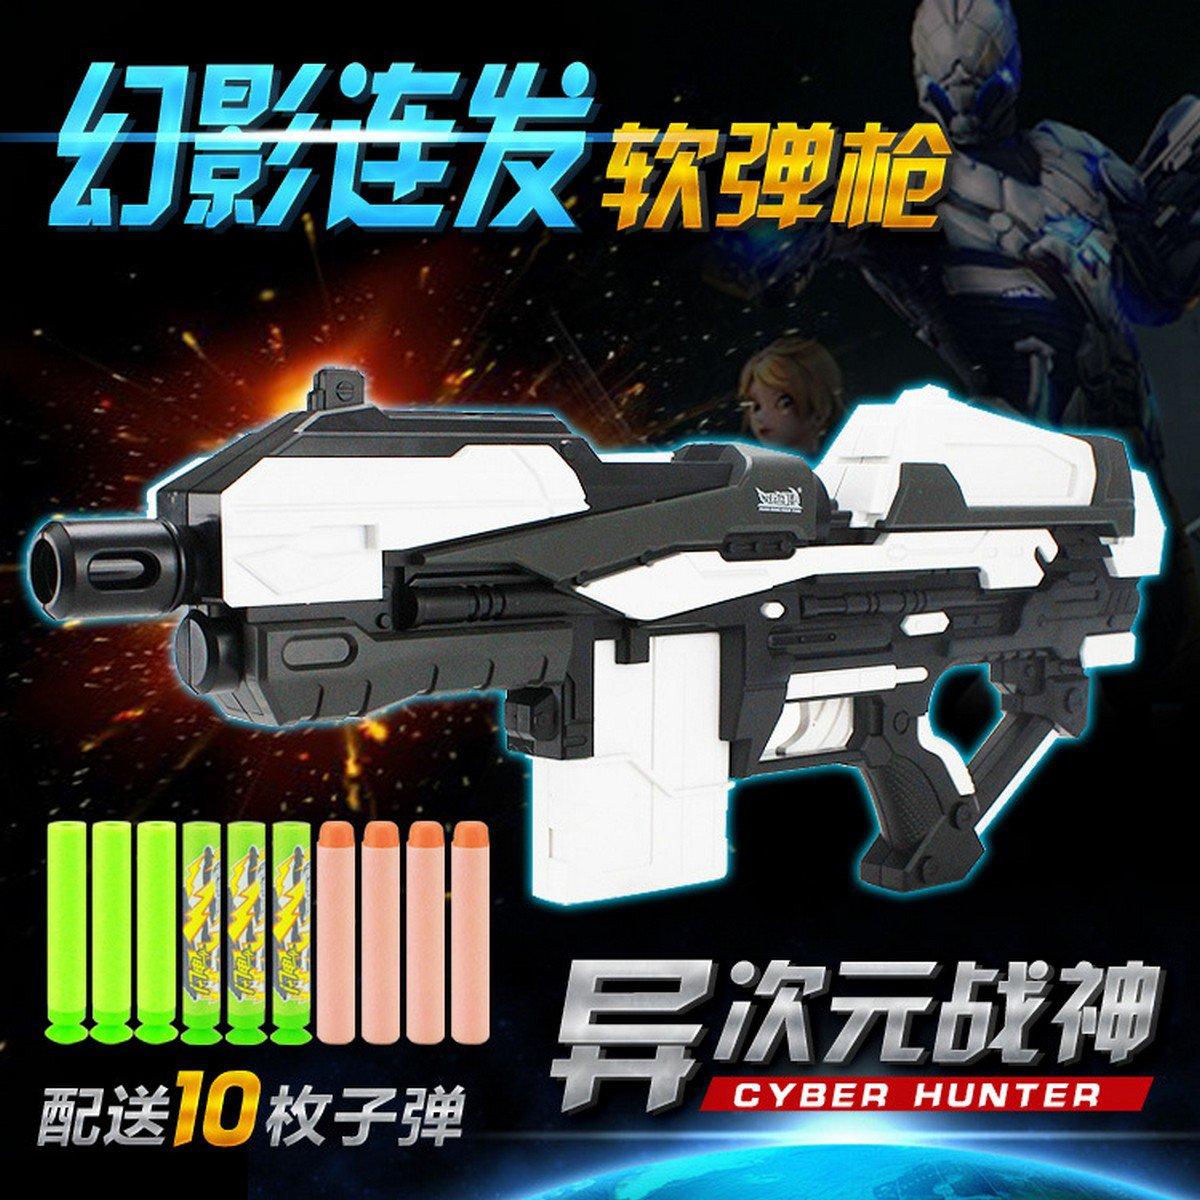 Buy Cool!Pump Rifle Airsoft Guns Far Range electric bursts Airgun Soft Bullet Gun Toy CS Game Shoot